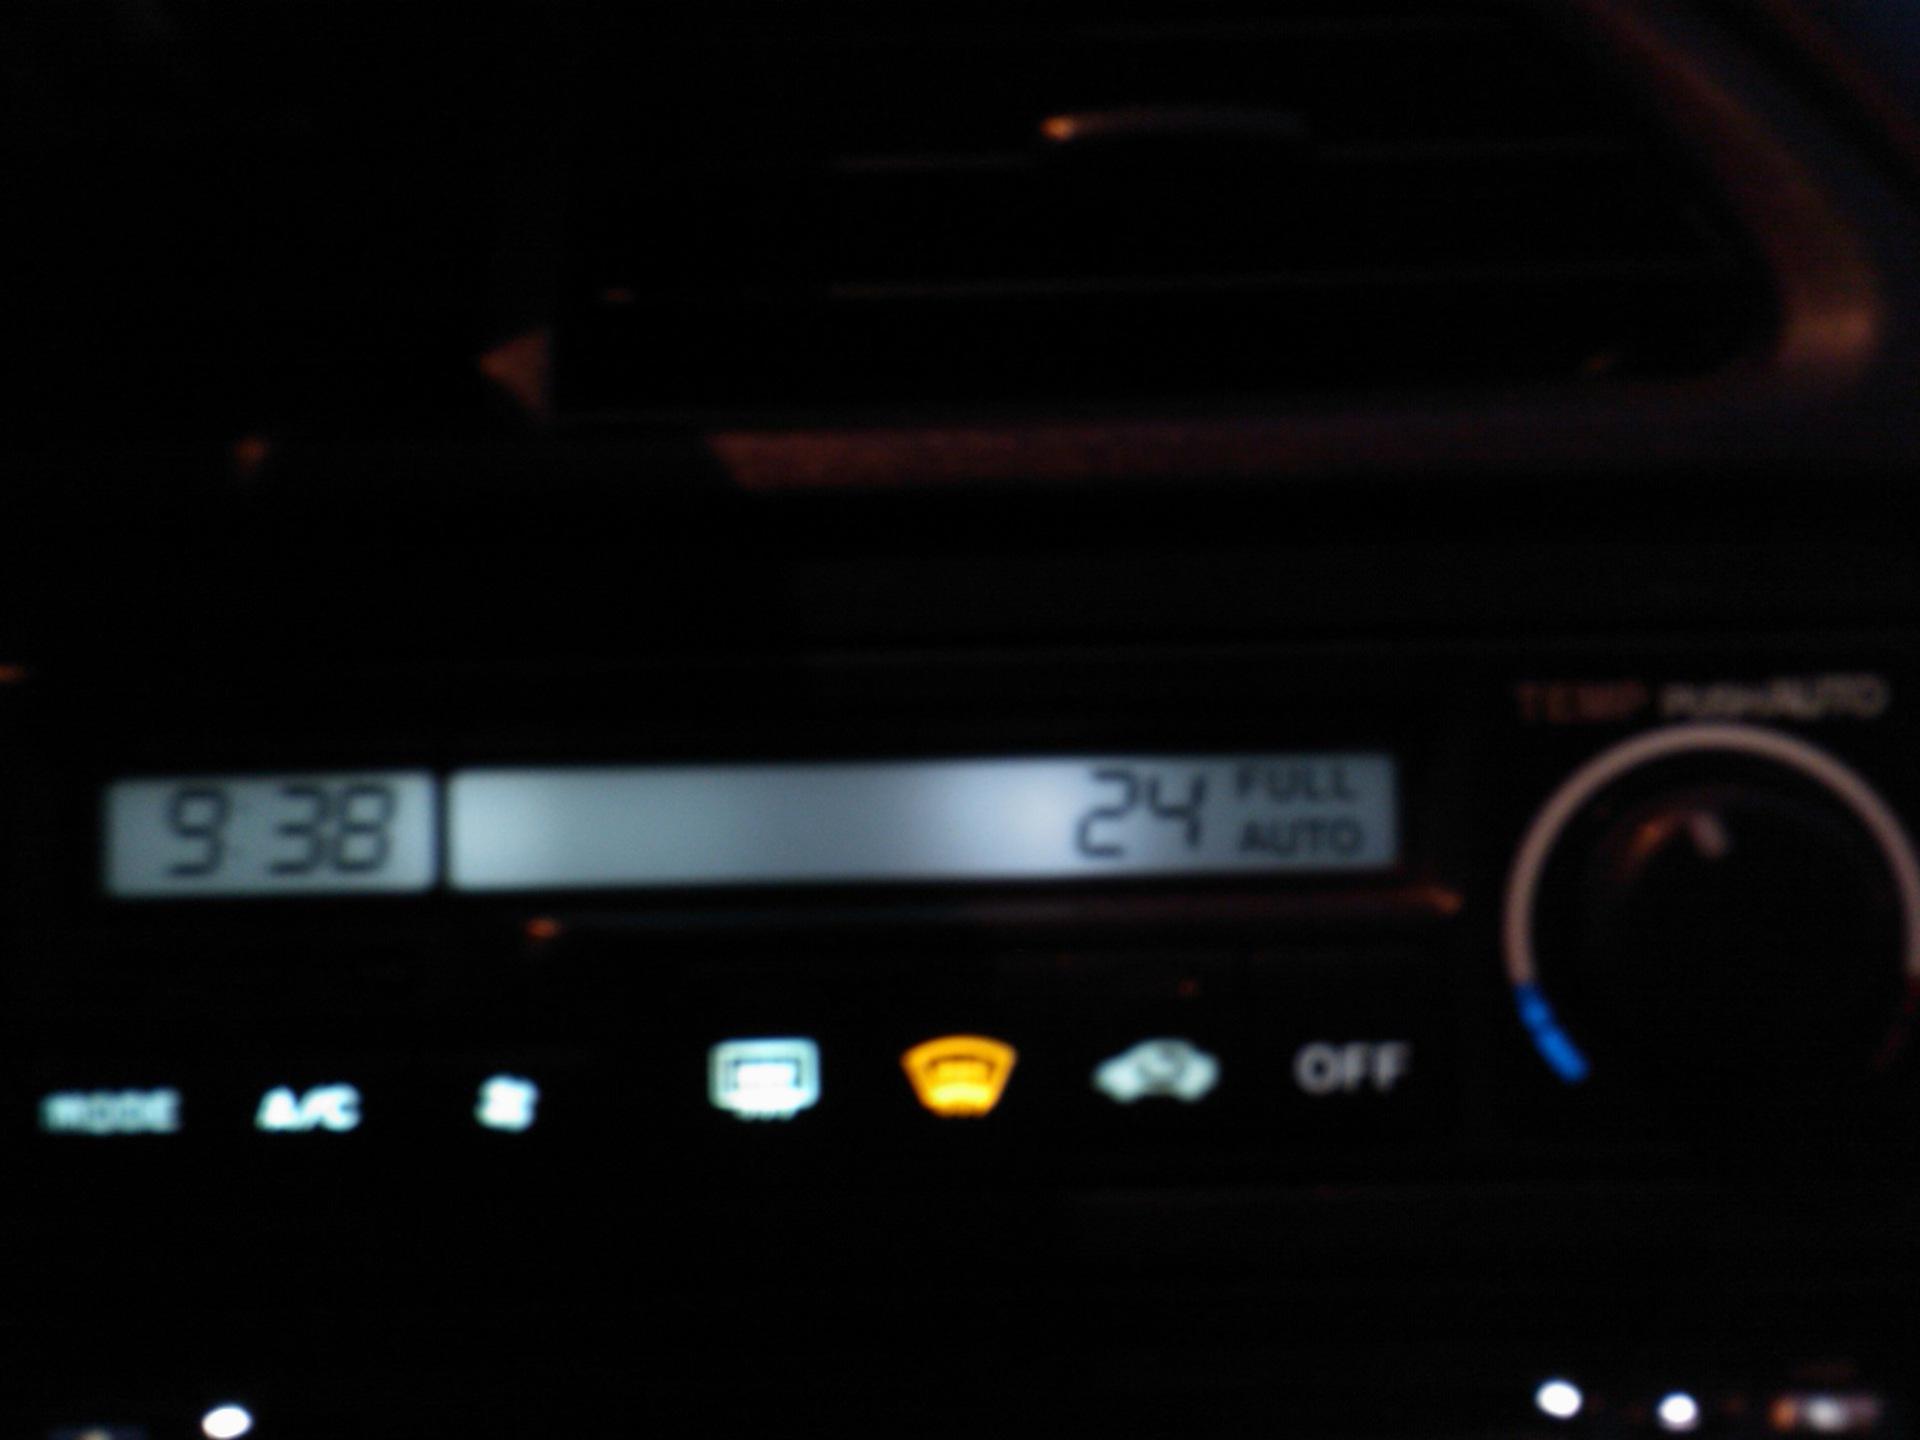 honda accord 1999 поменять лампу подсветка часов